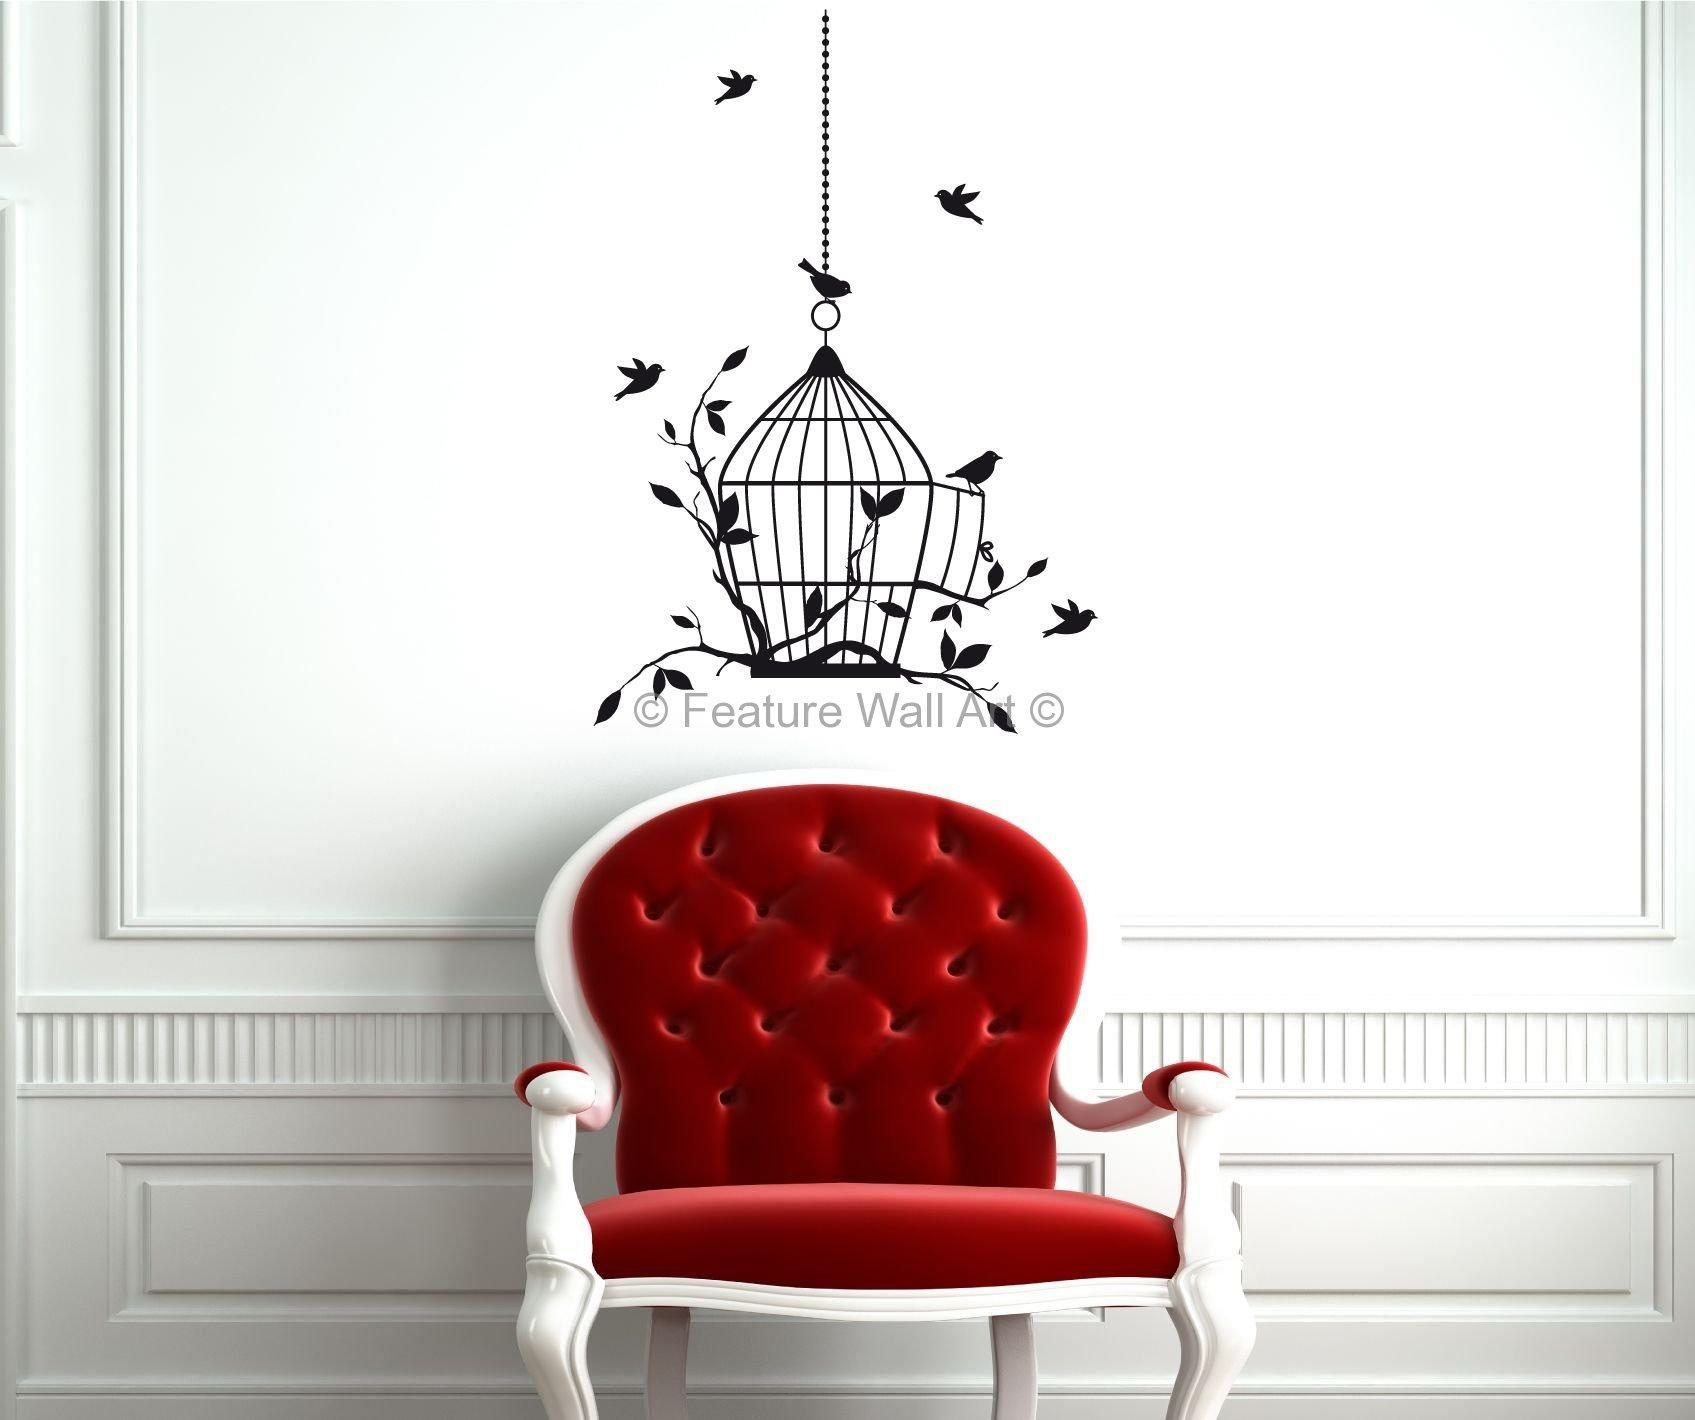 Wall Arts Popular Wall Art Ideas On Metal Wall Art Decor – Home Inside Metal Birdcage Wall Art (Image 18 of 20)